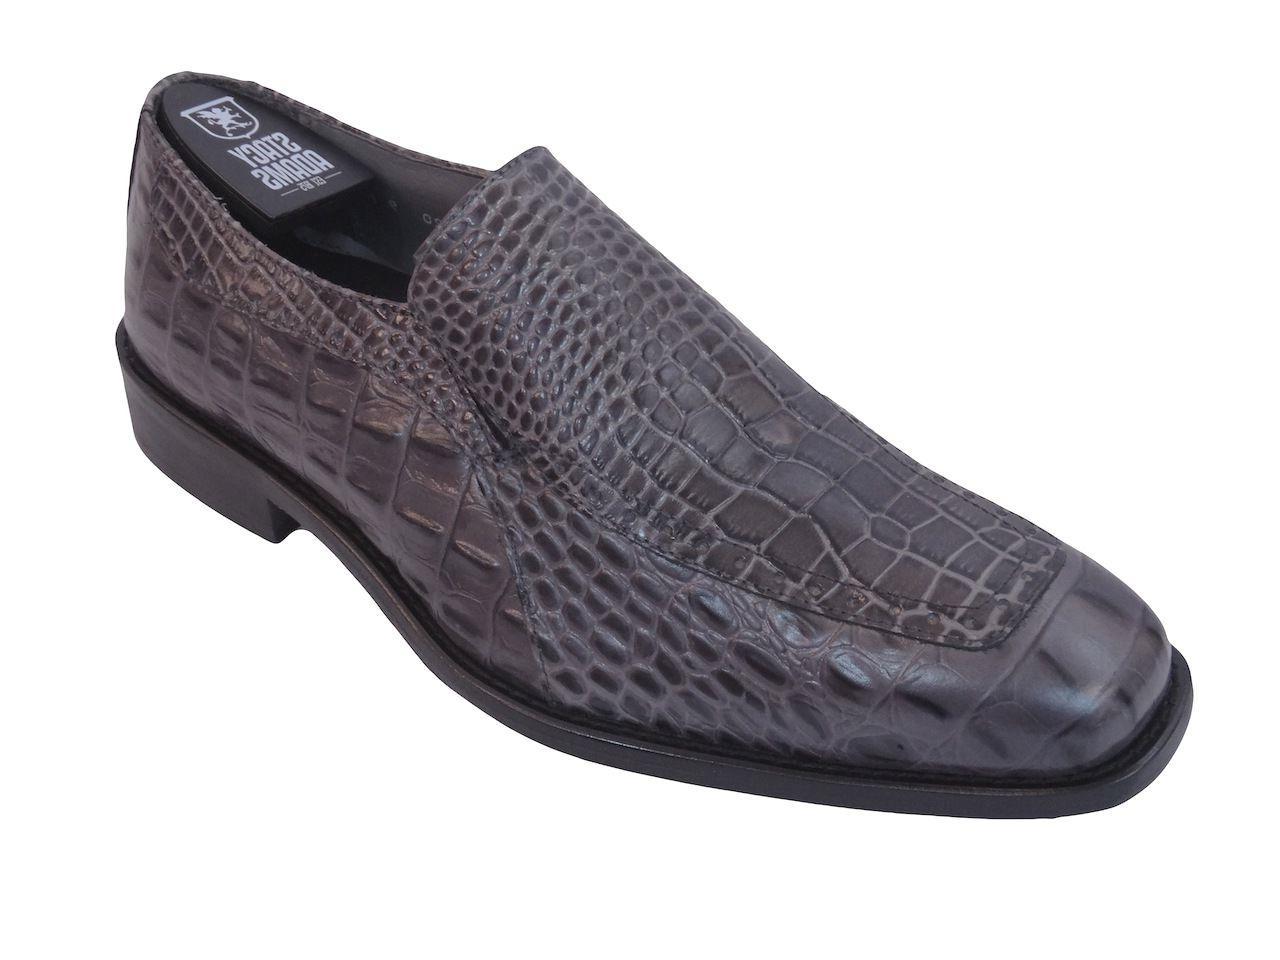 Mens Stacy Adams Shoes Moc Toe Slip On Loafer